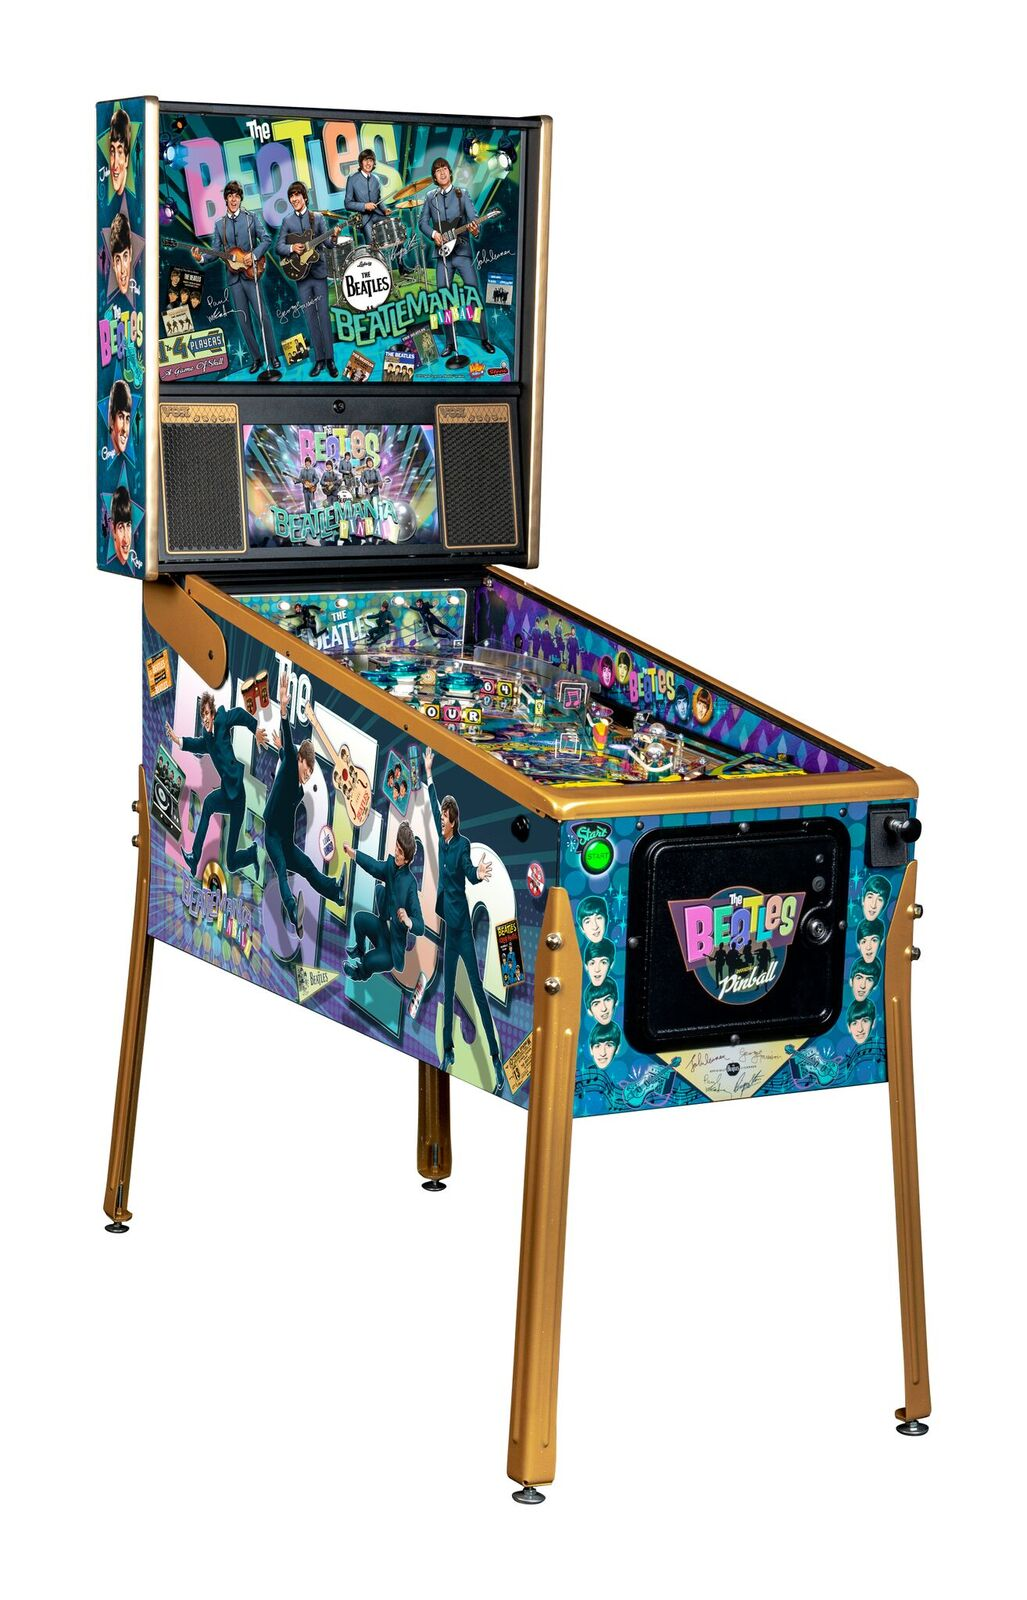 Stern Beatles Gold Edition Pinball Machine